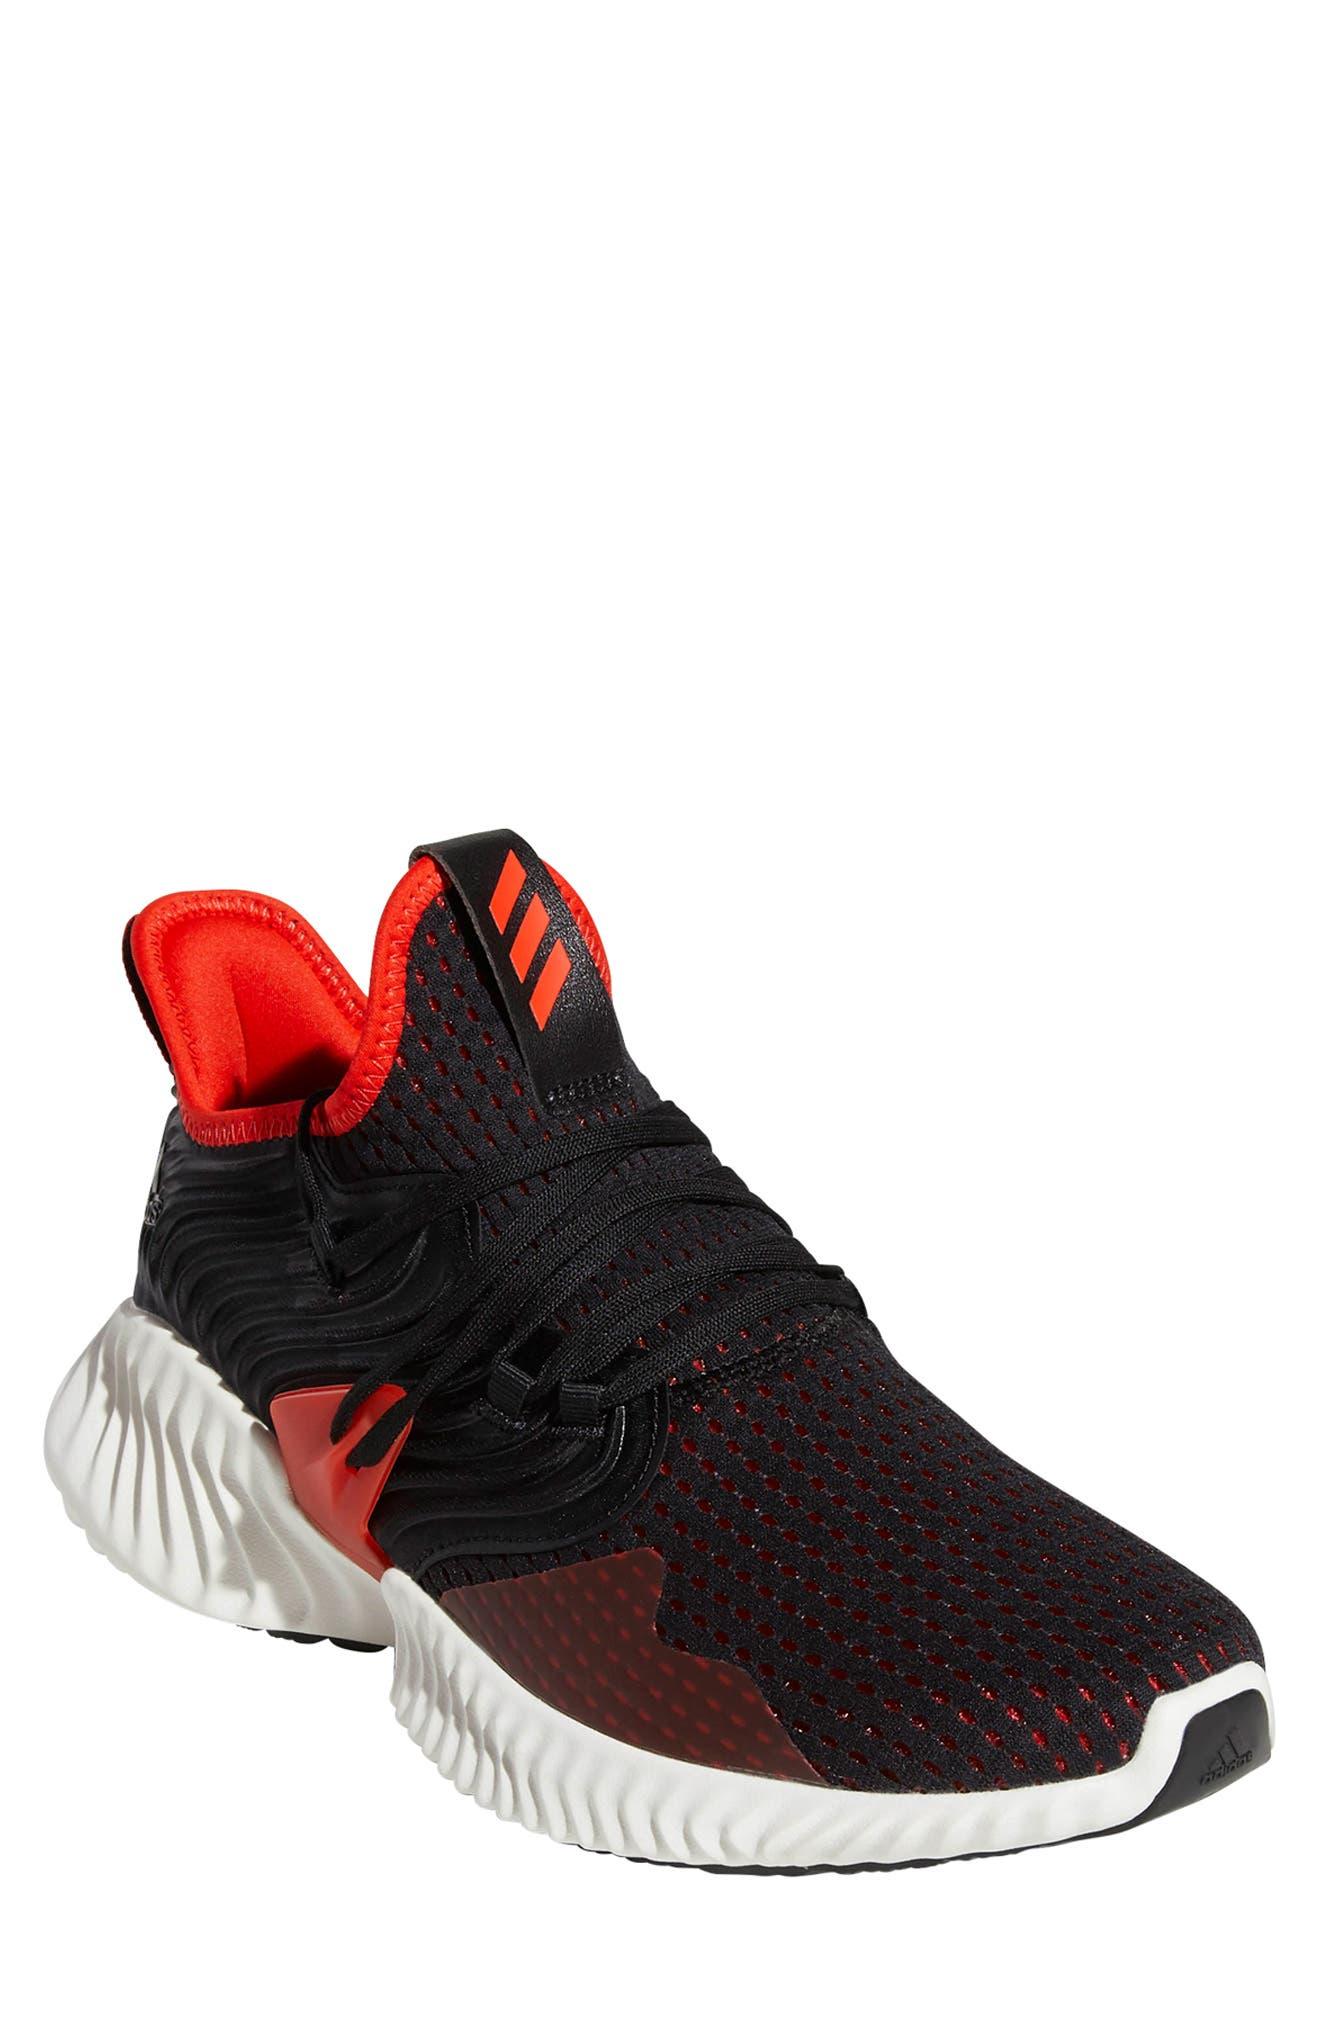 63fe6e5a4e591 adidas - Men s Casual Fashion Shoes and Sneakers